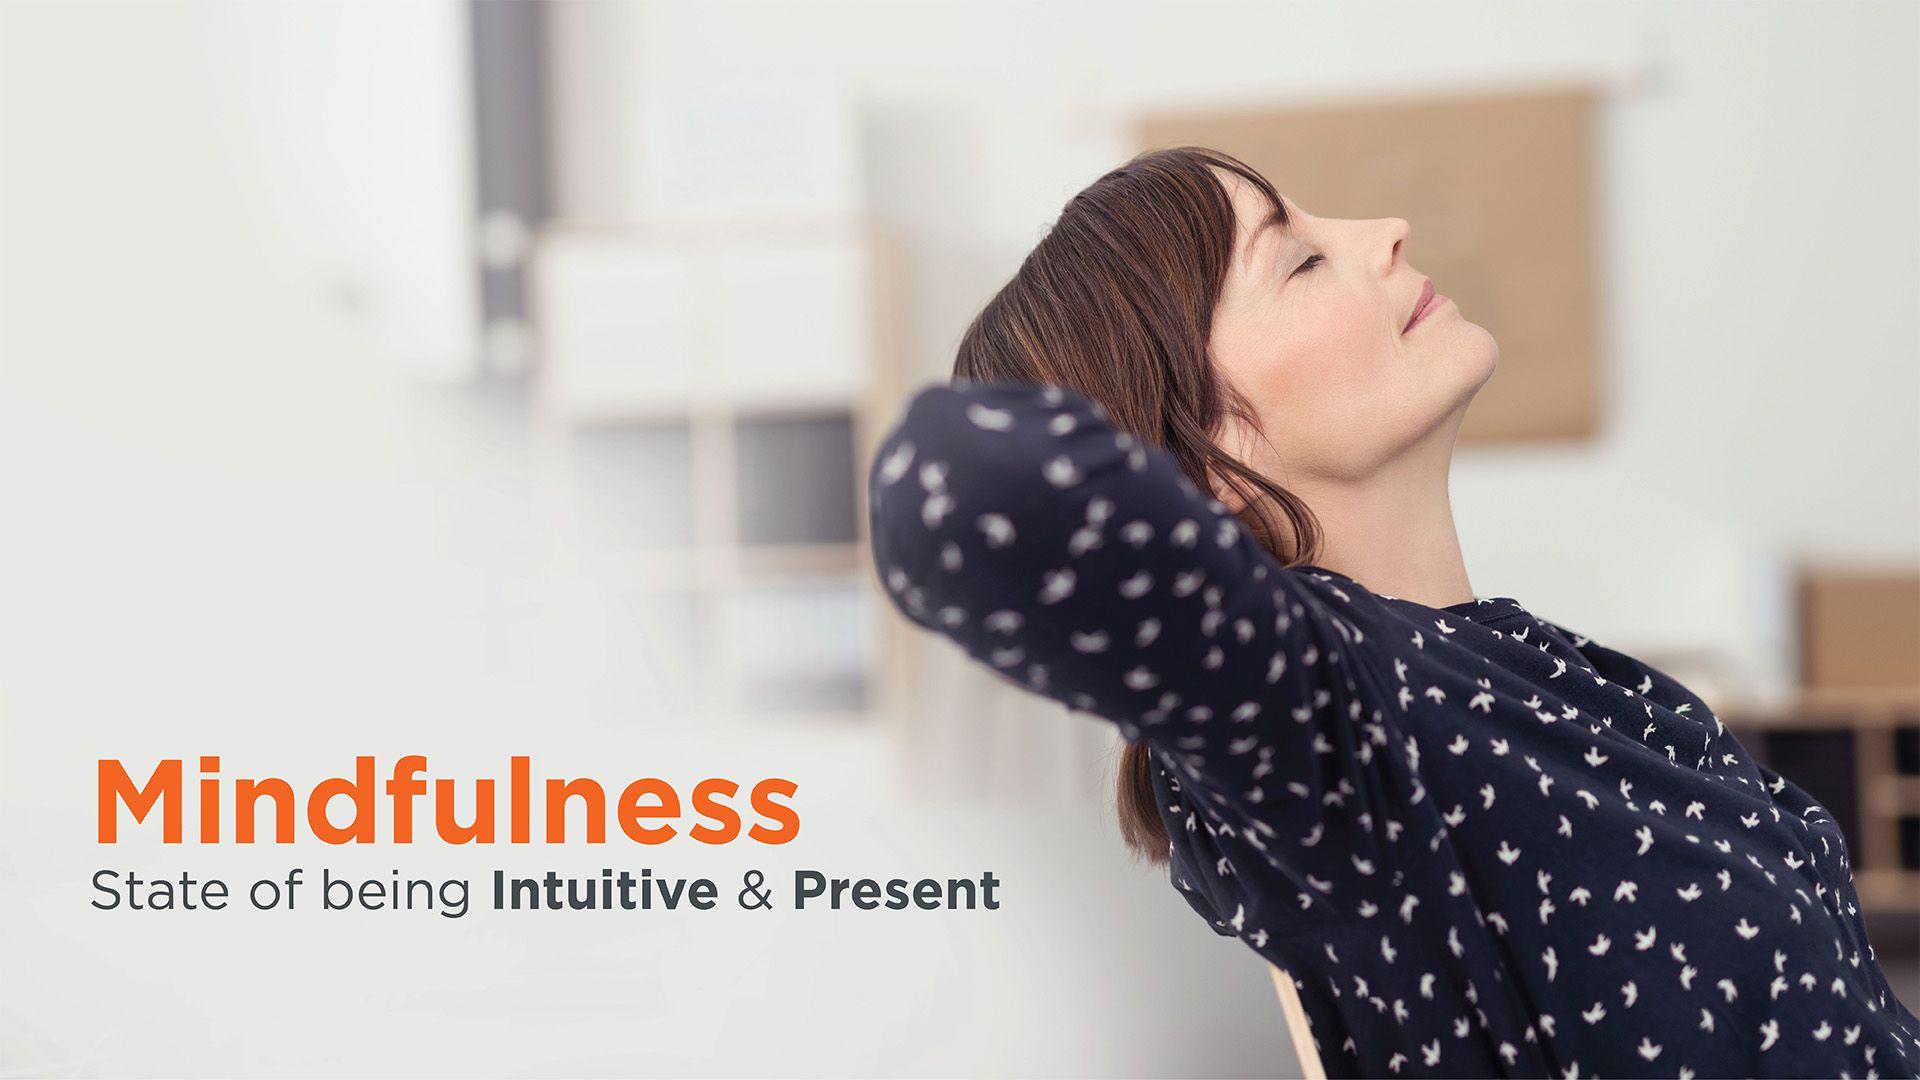 Mindfulness, Employee Care